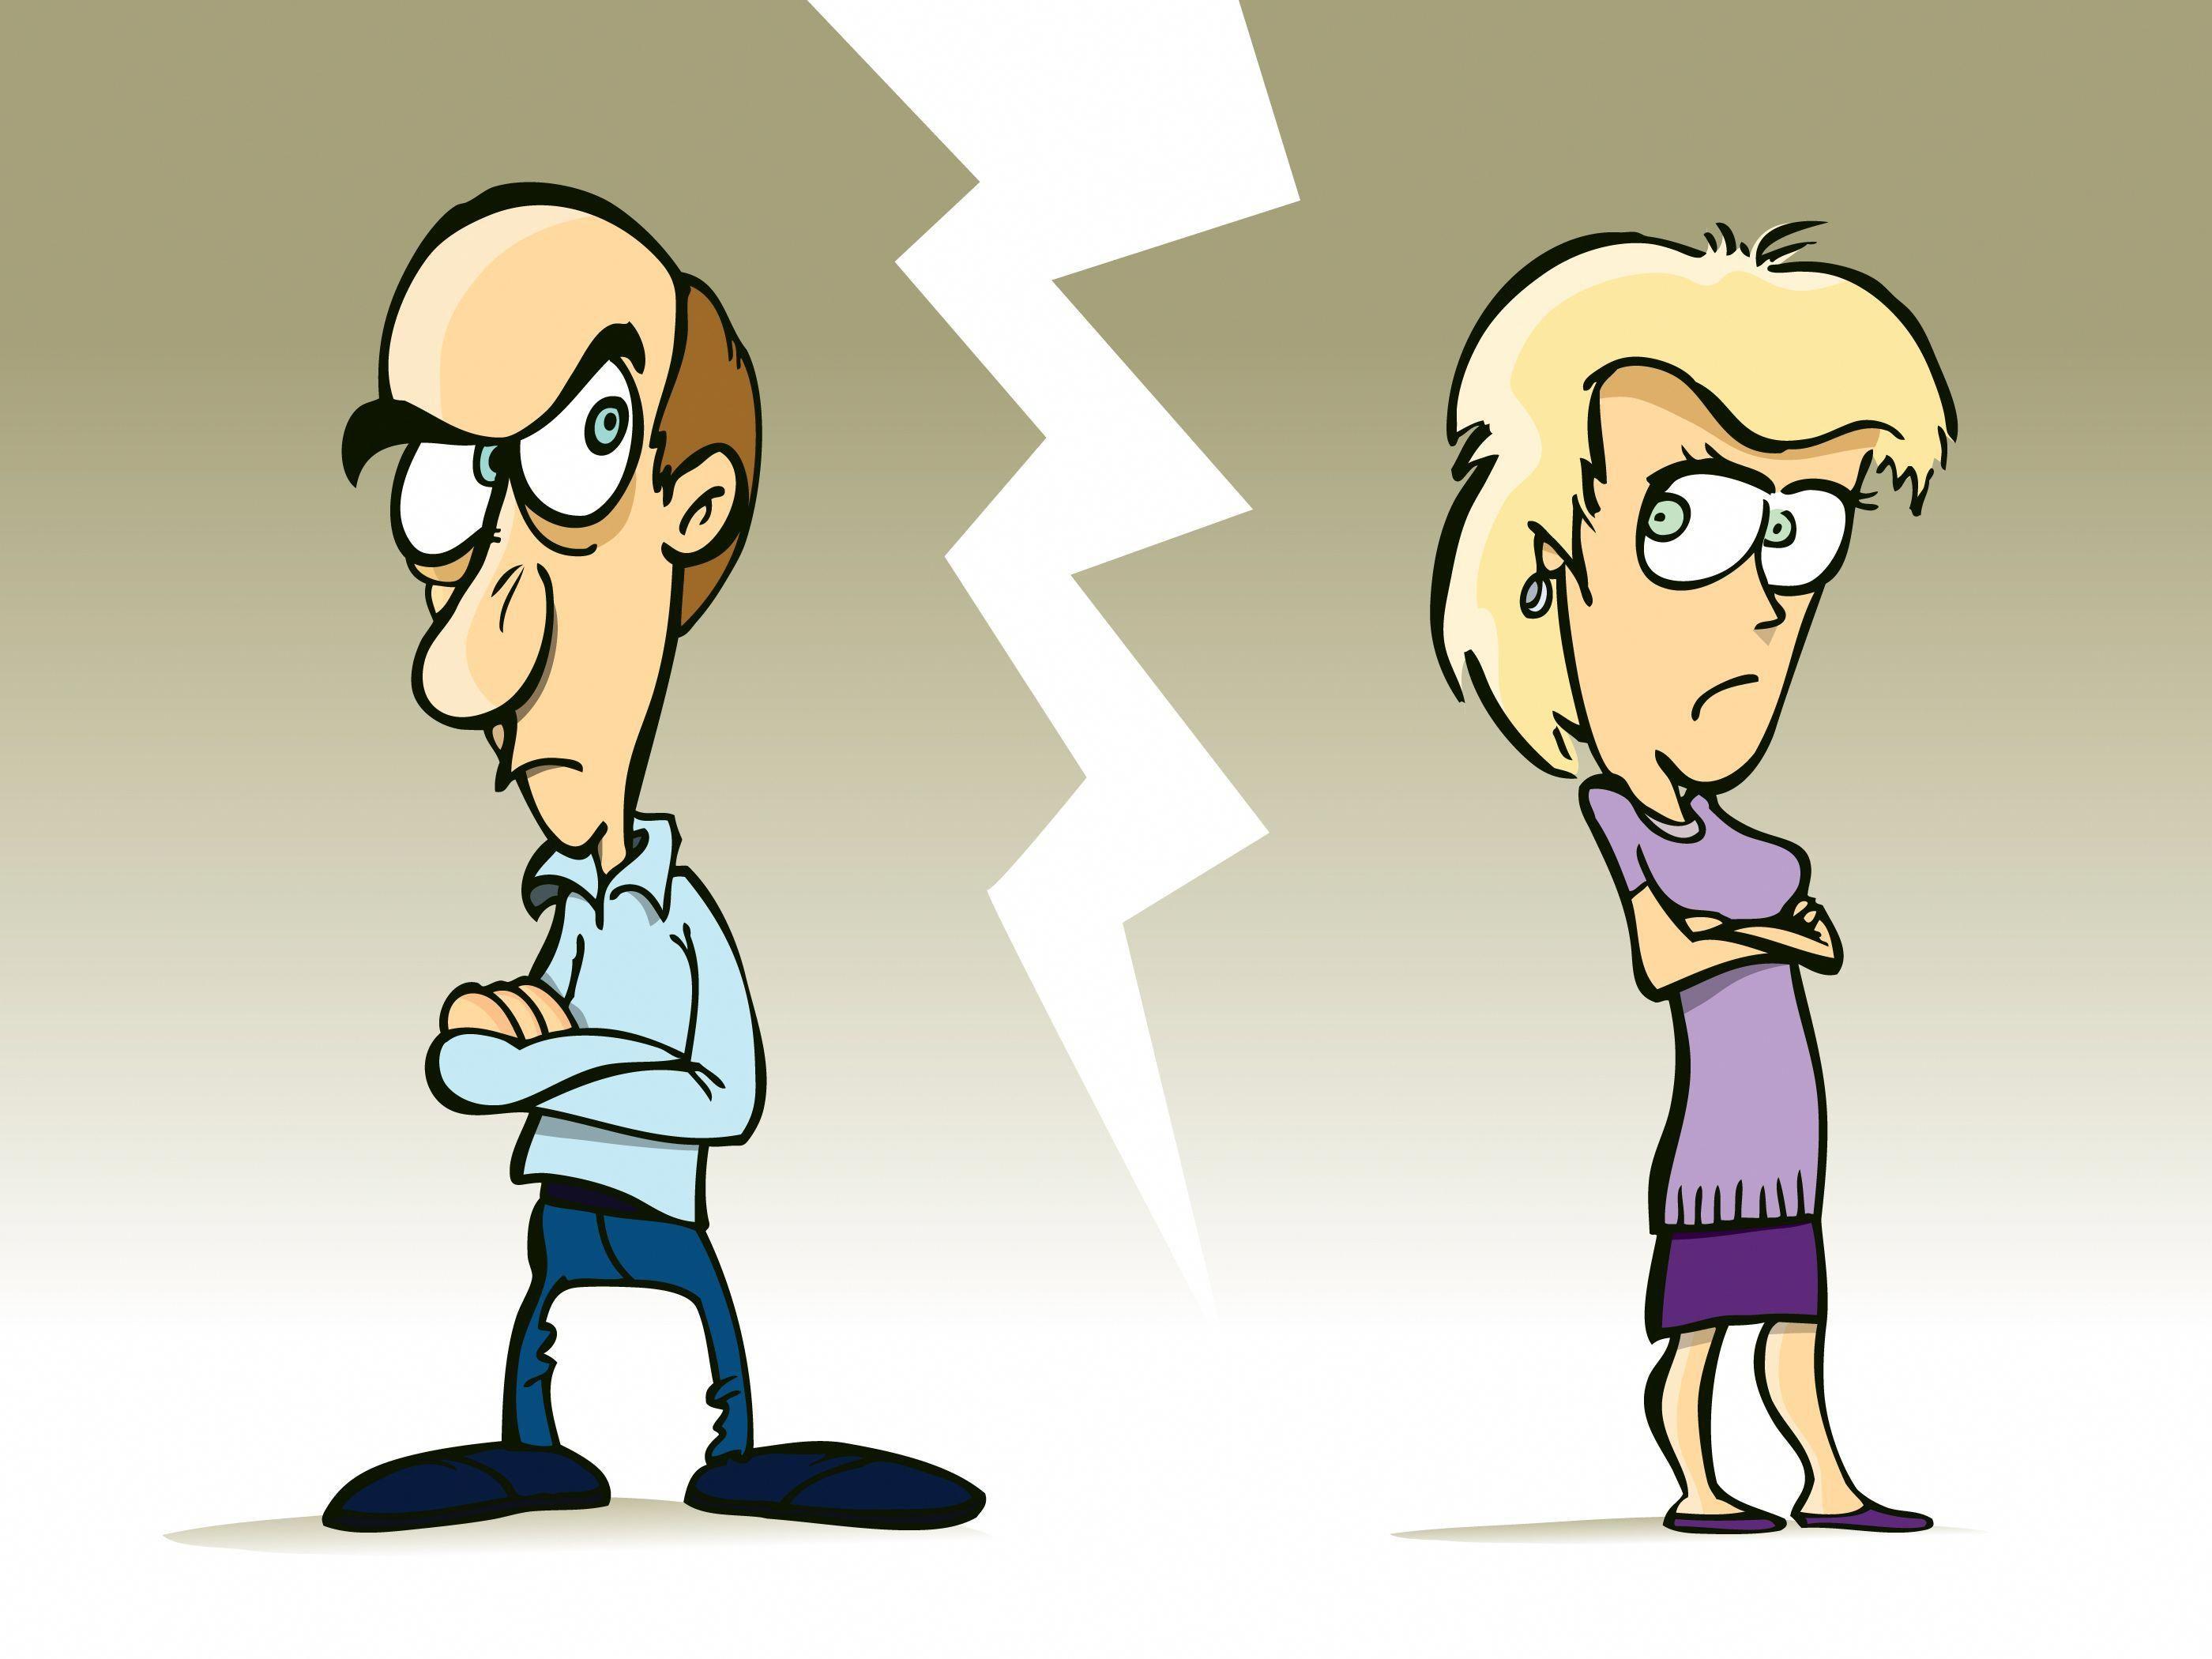 Love a good Laugh: THE BEST DIVORCE LETTER EVER